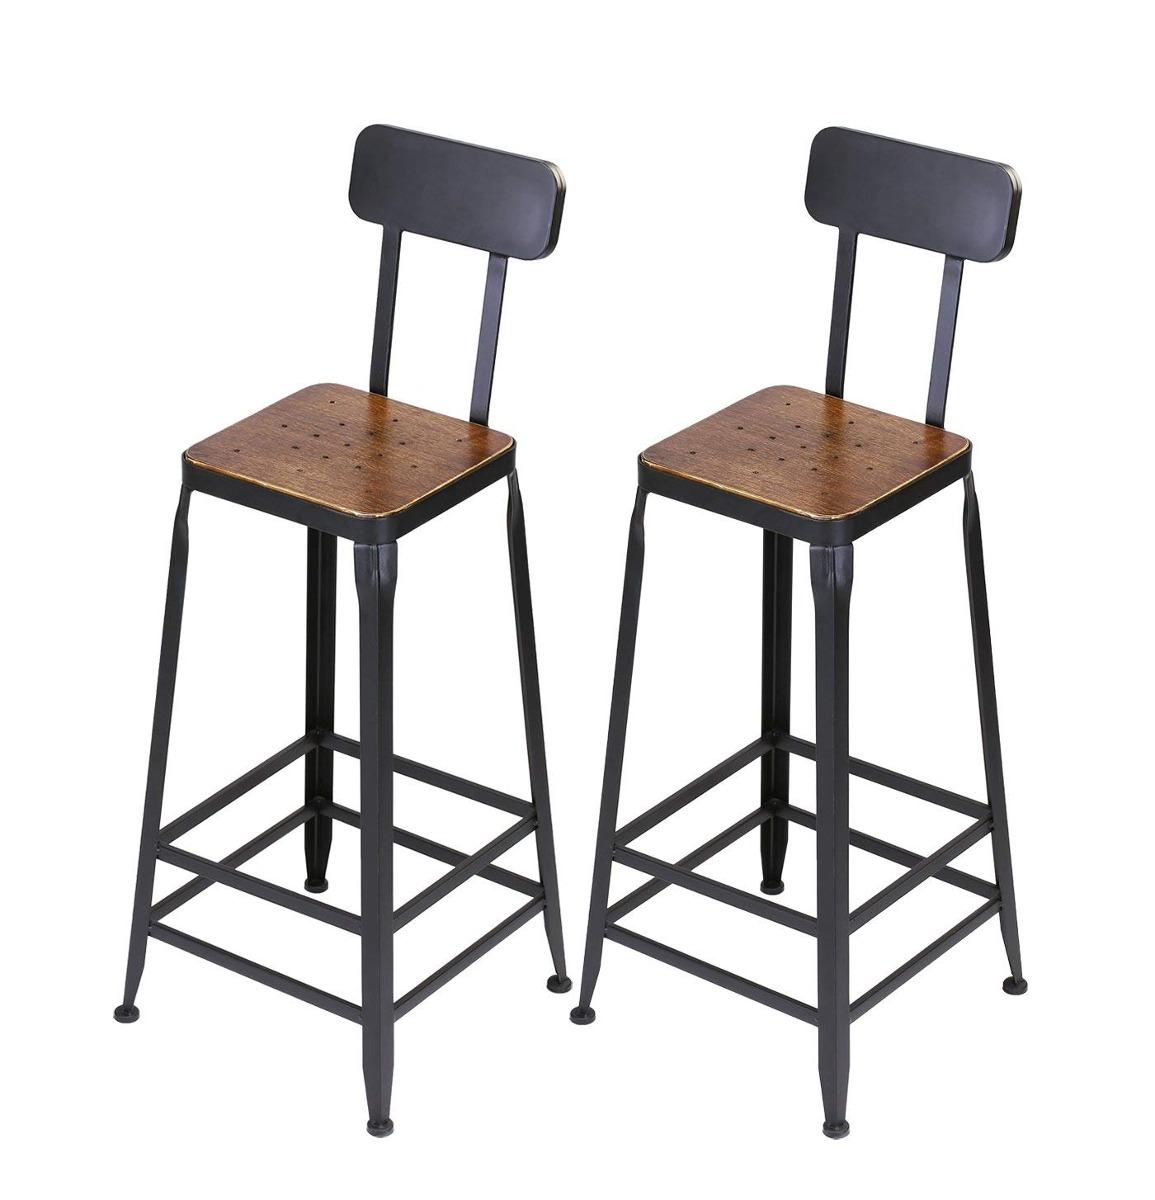 80986343311a4 vilavita set of 2 pine wood bar stools wooden top with me... Cargando zoom.